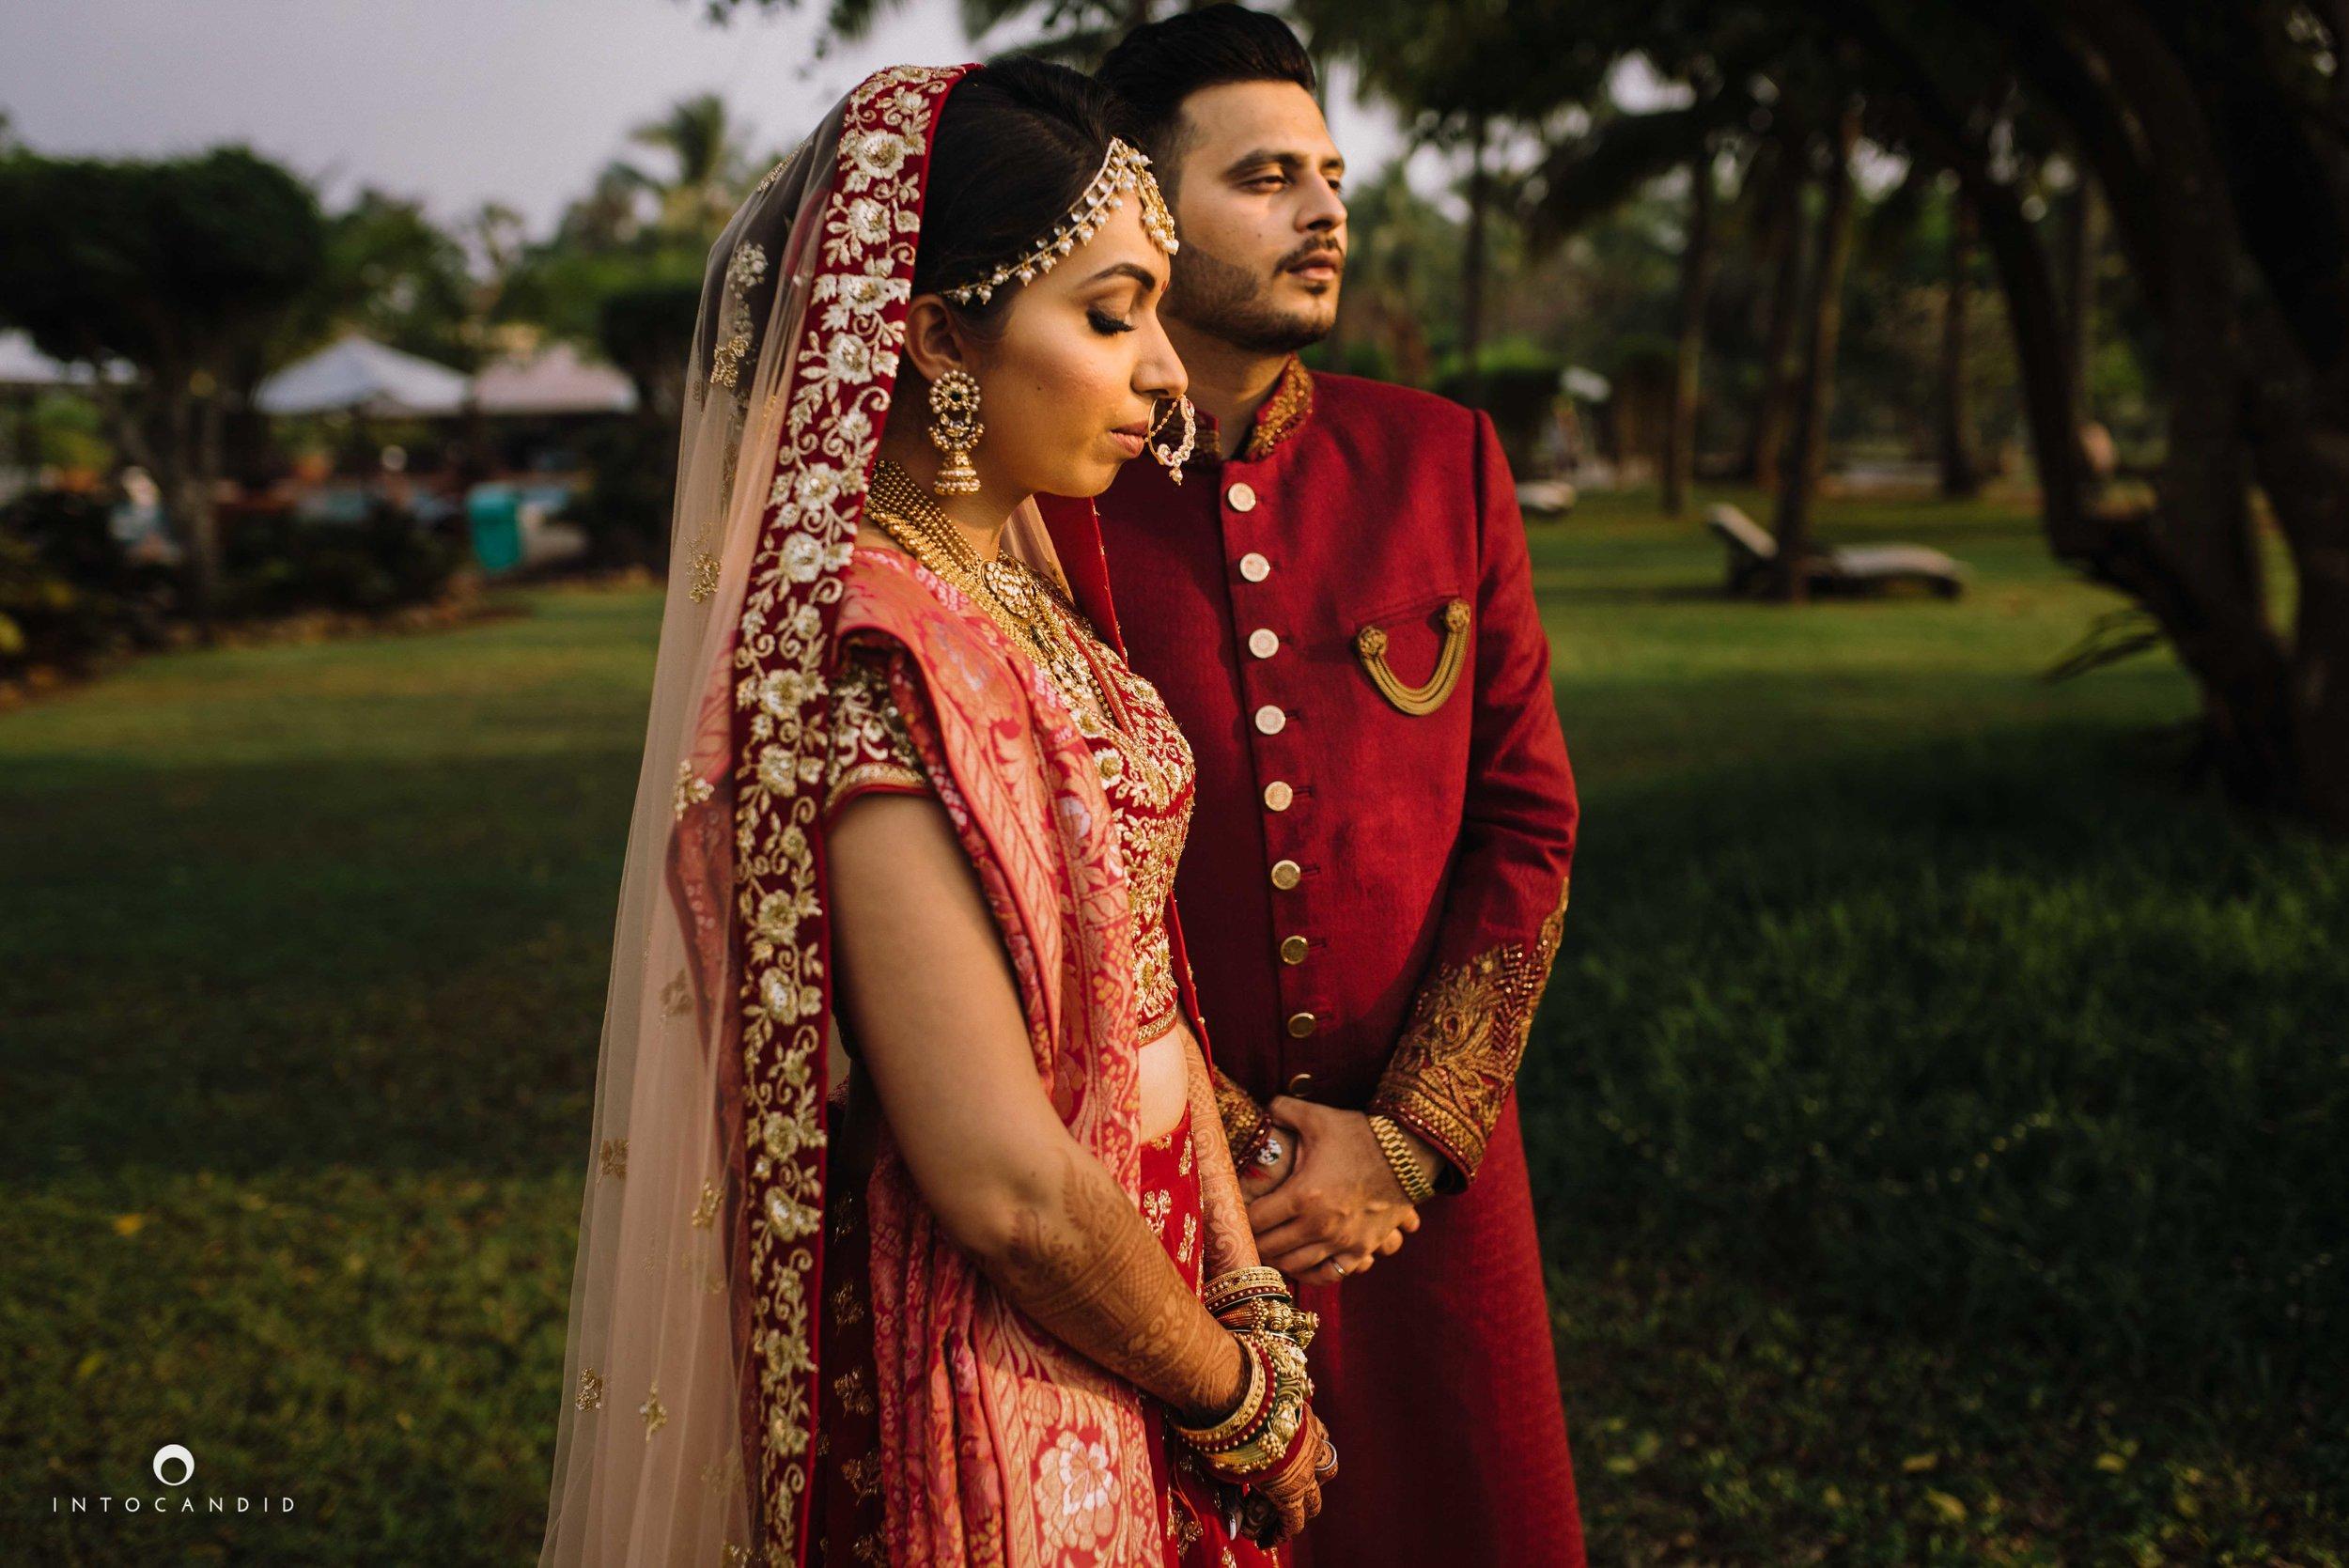 Goa_Wedding_Photographer_Zuri_whitesands_077.jpg